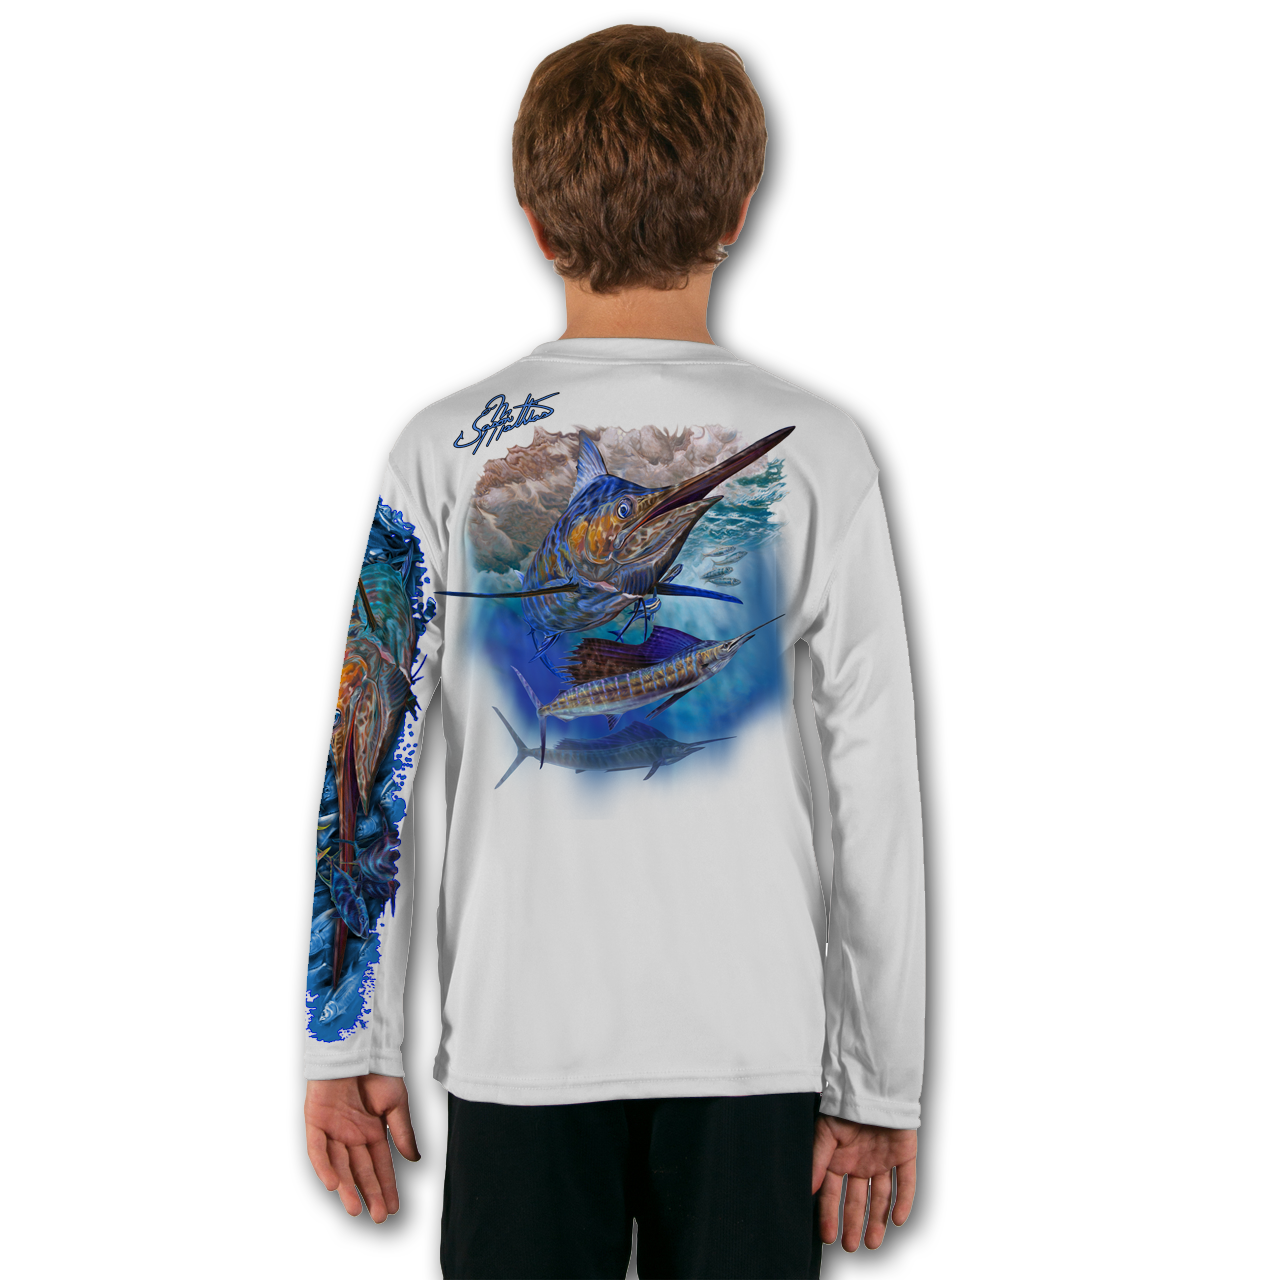 blue-marlin-sailfish-white-youth-solar-ls-back-performance-shirt.png